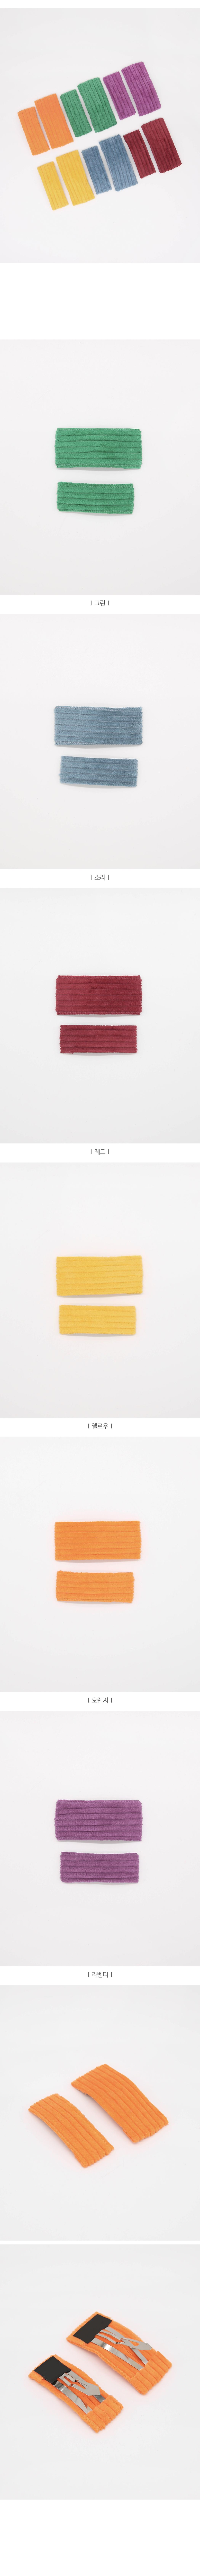 Corduroy snap pin